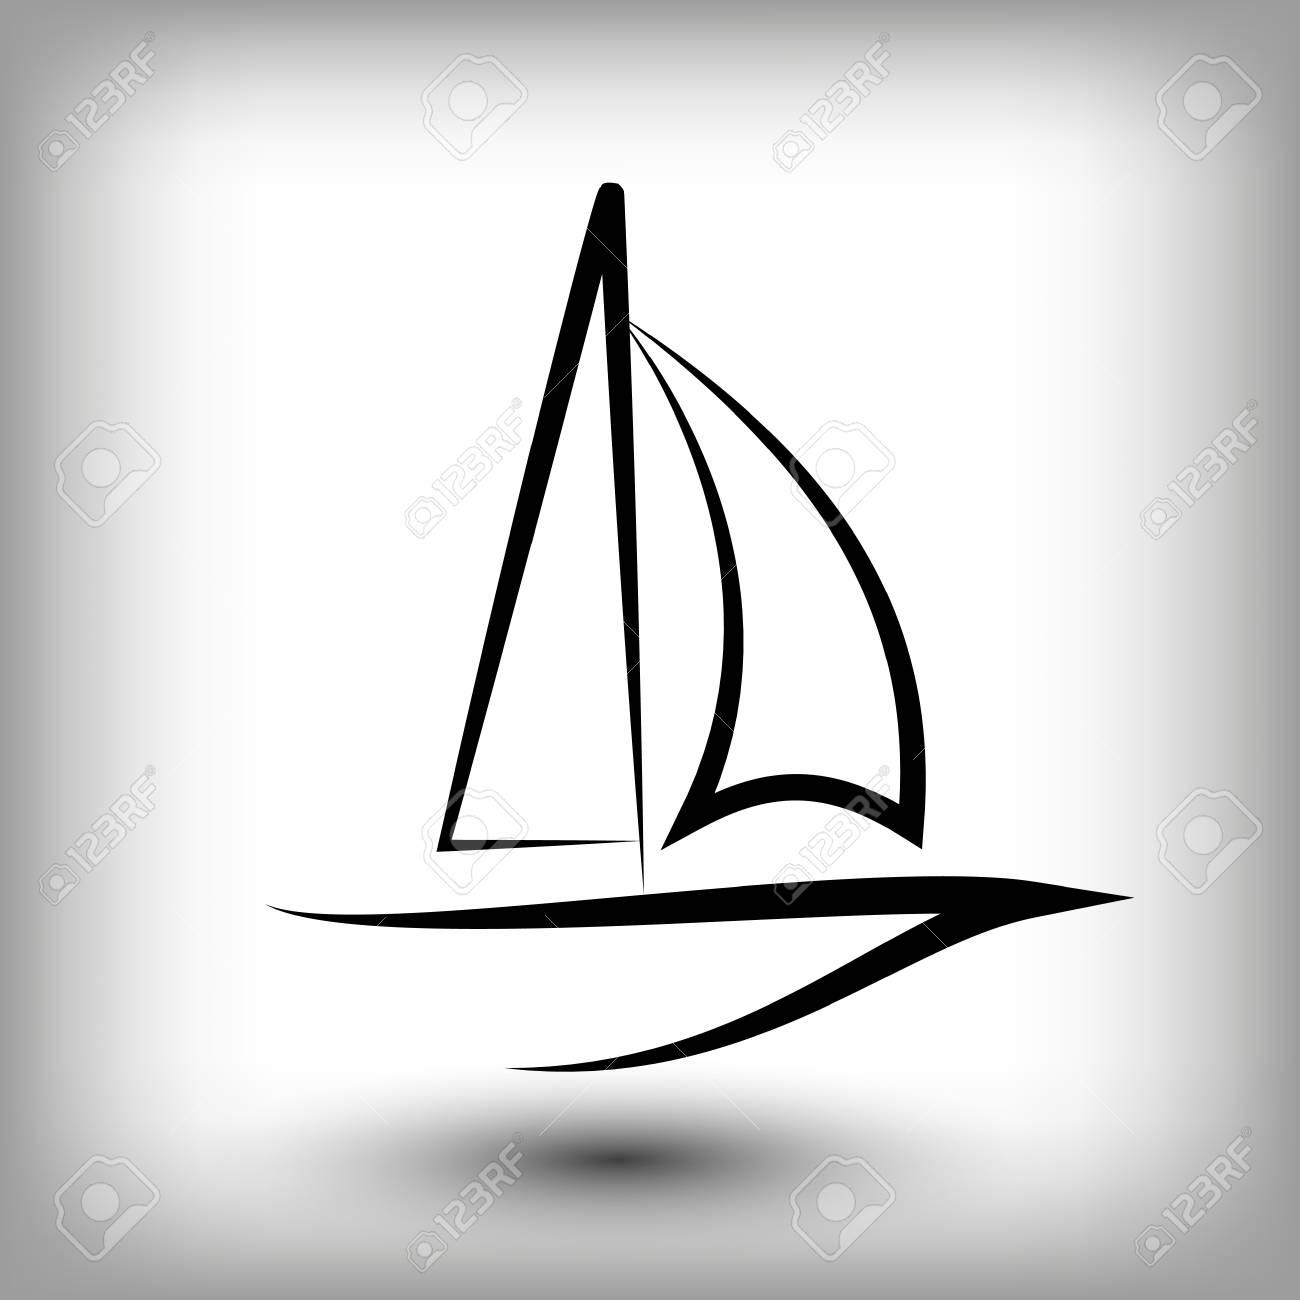 yacht logo templates sail boat silhouettes line sail icon